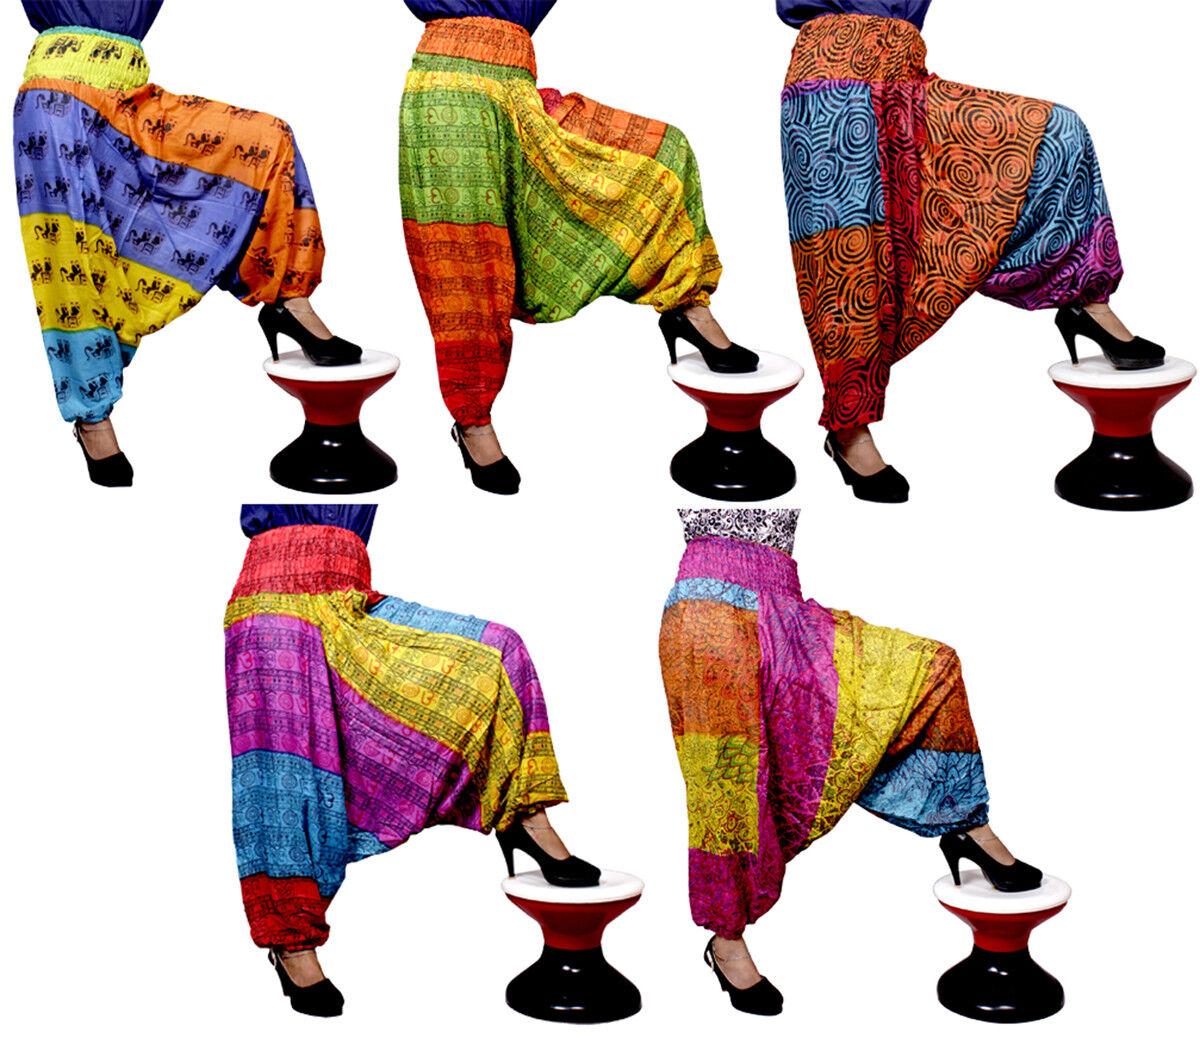 5 10 25 pcs Aladdin Hippie Design Pants Casual Gypsy Baggy Trouser Wholesale Lot